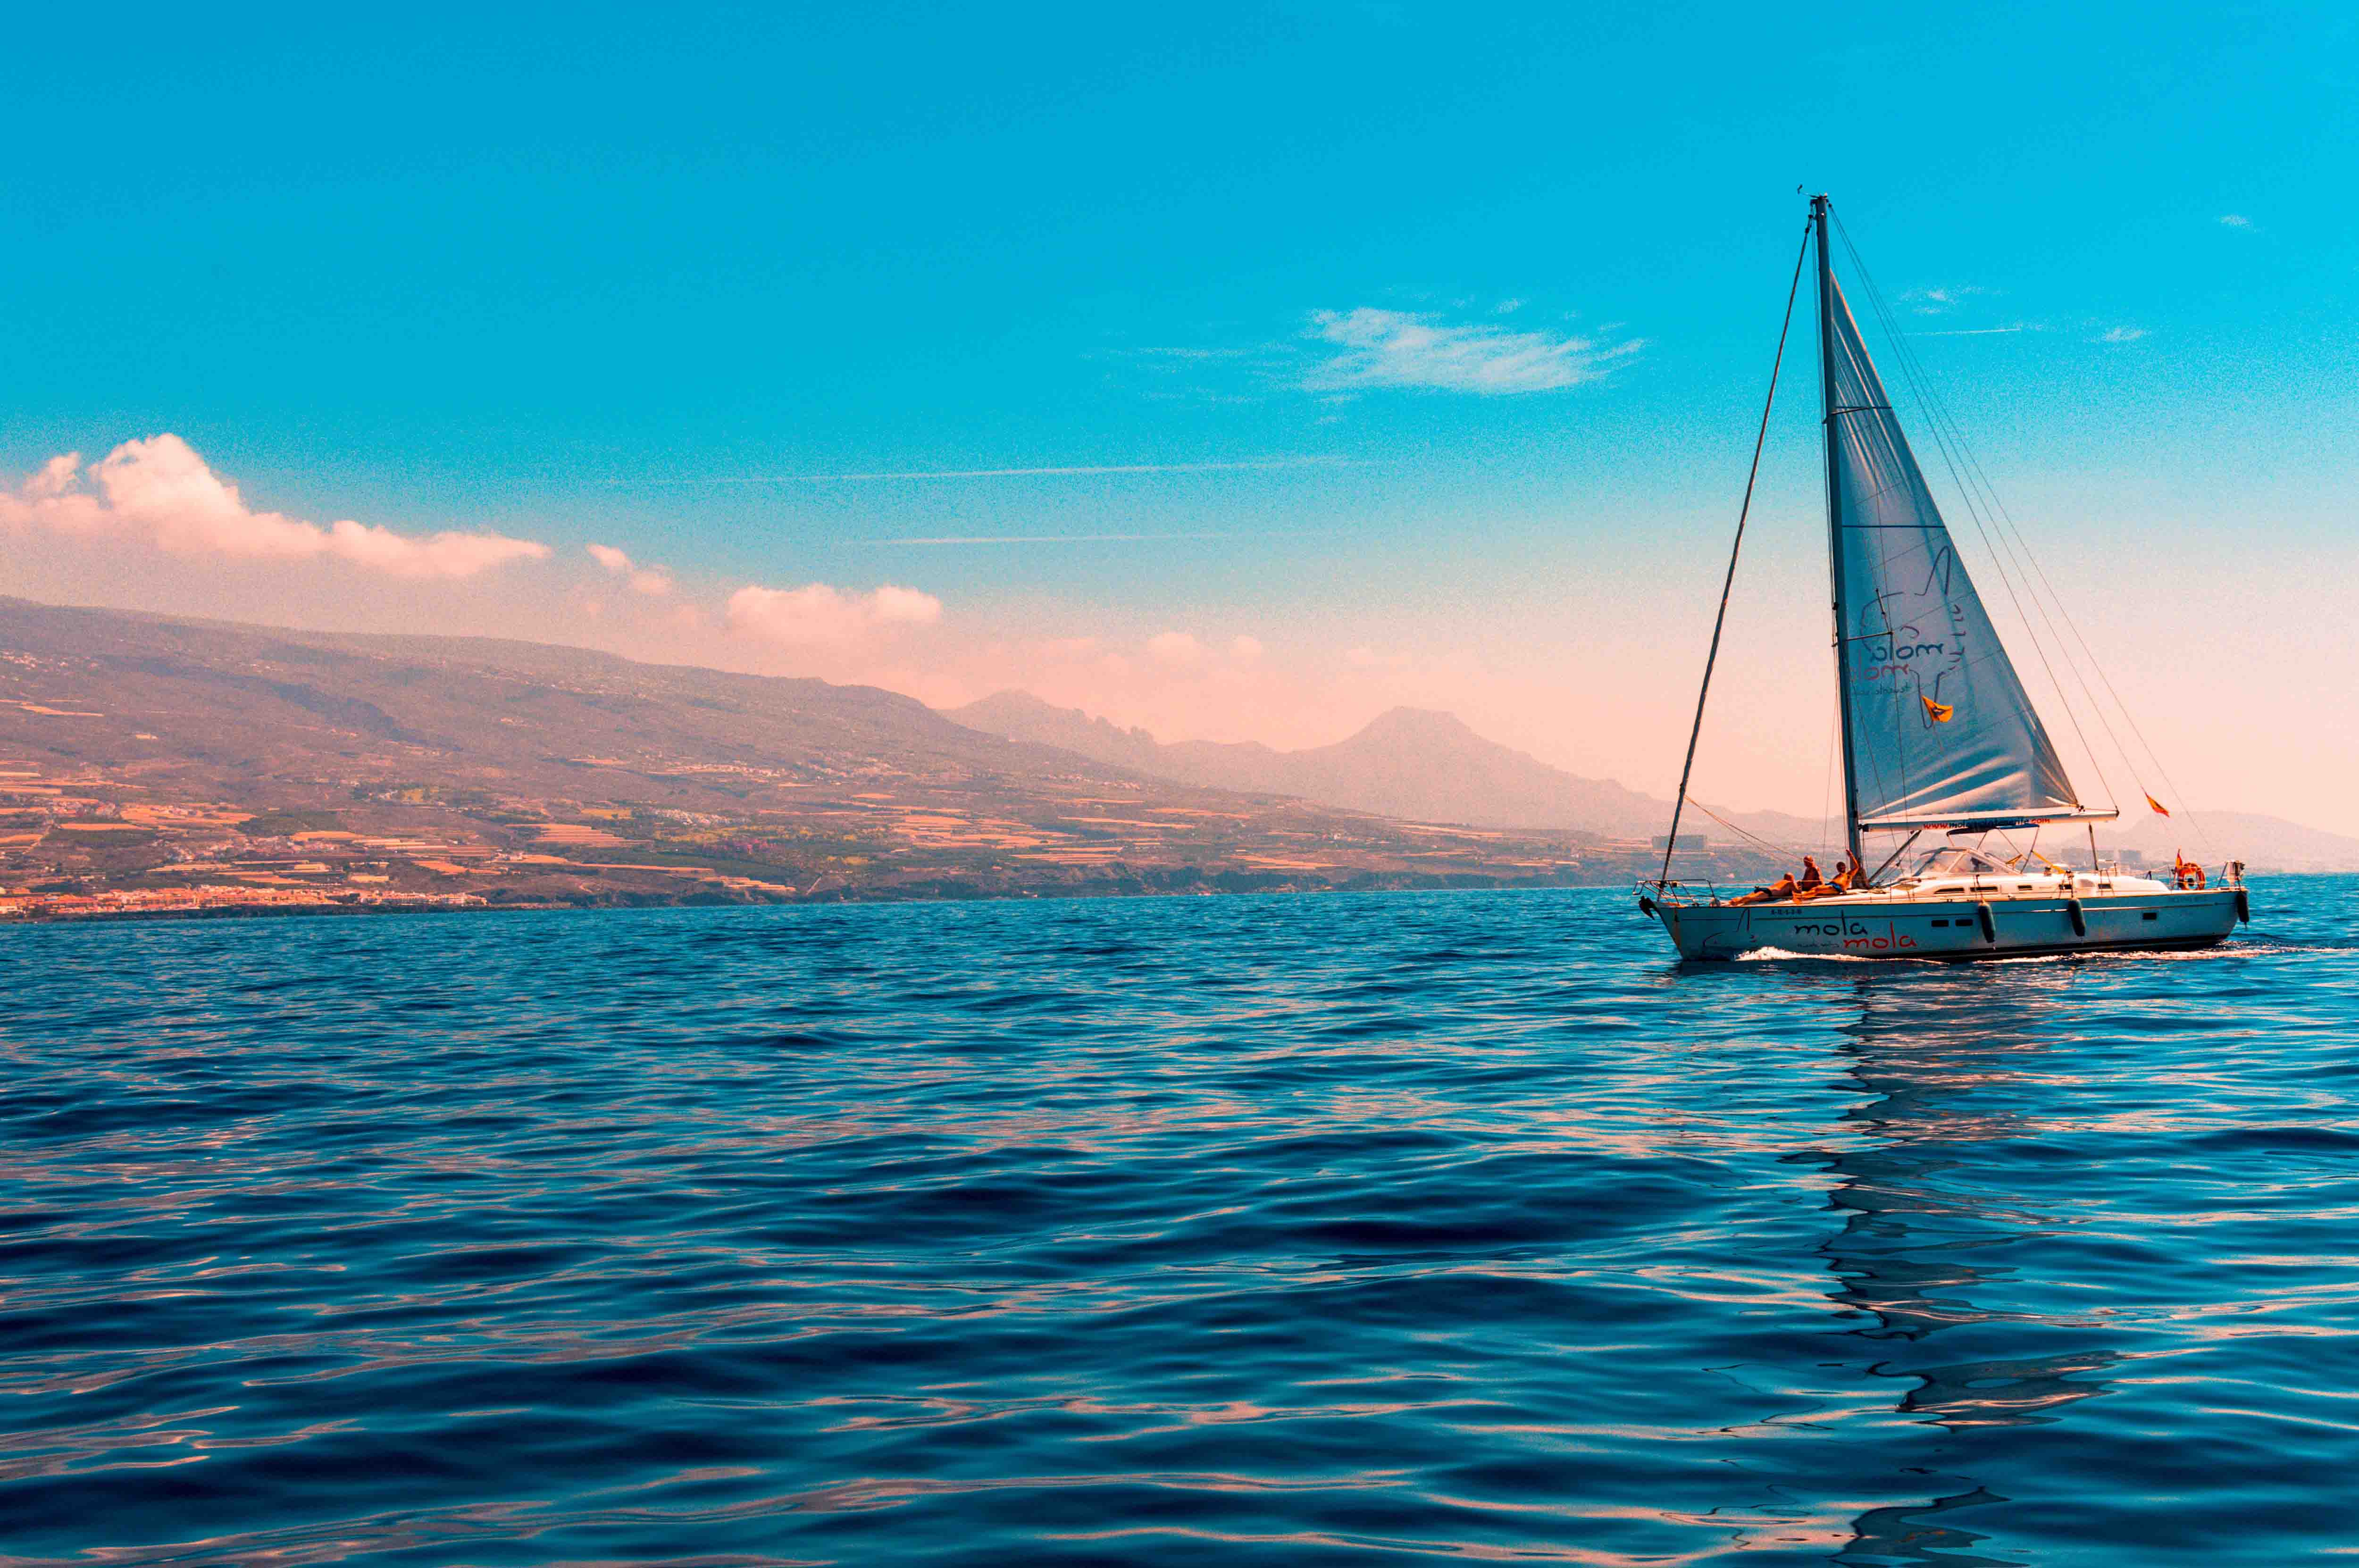 du lịch biển có thuyền